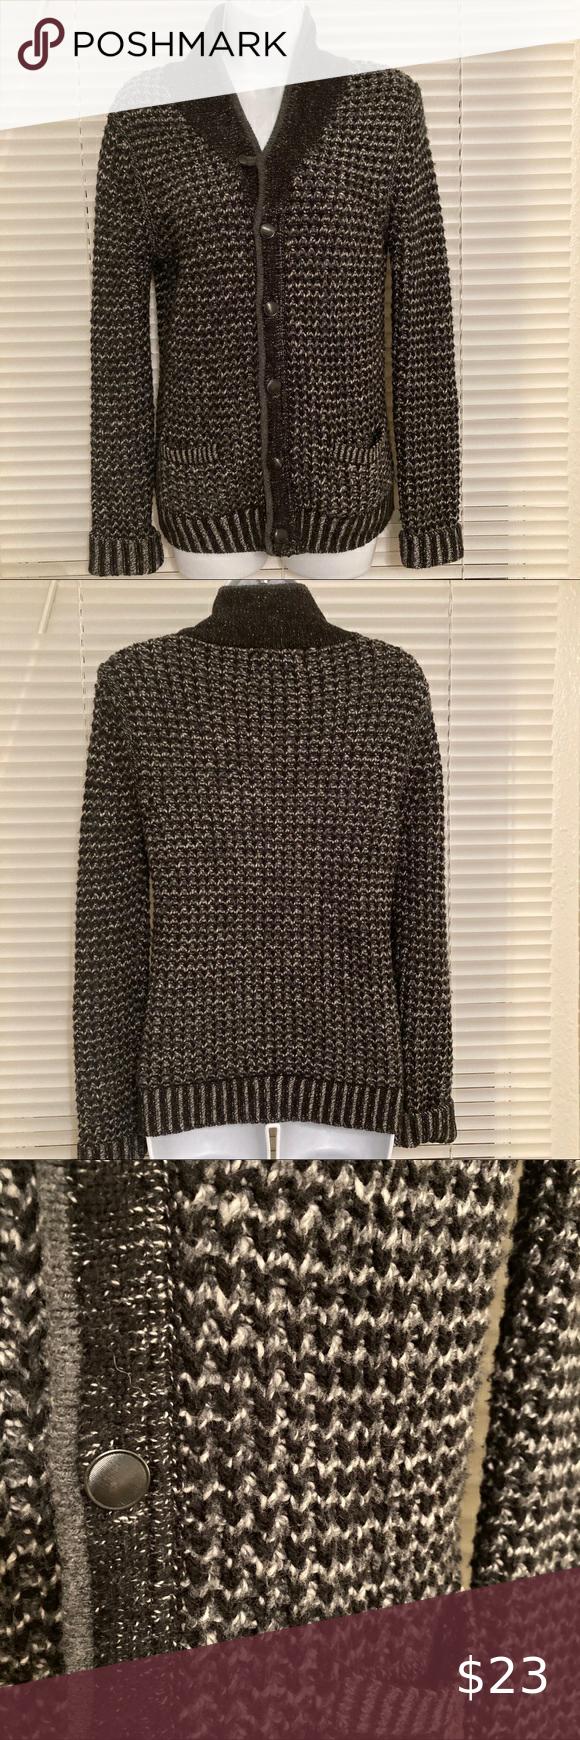 rag & bone / Neiman Marcus Cardigan/Sweater